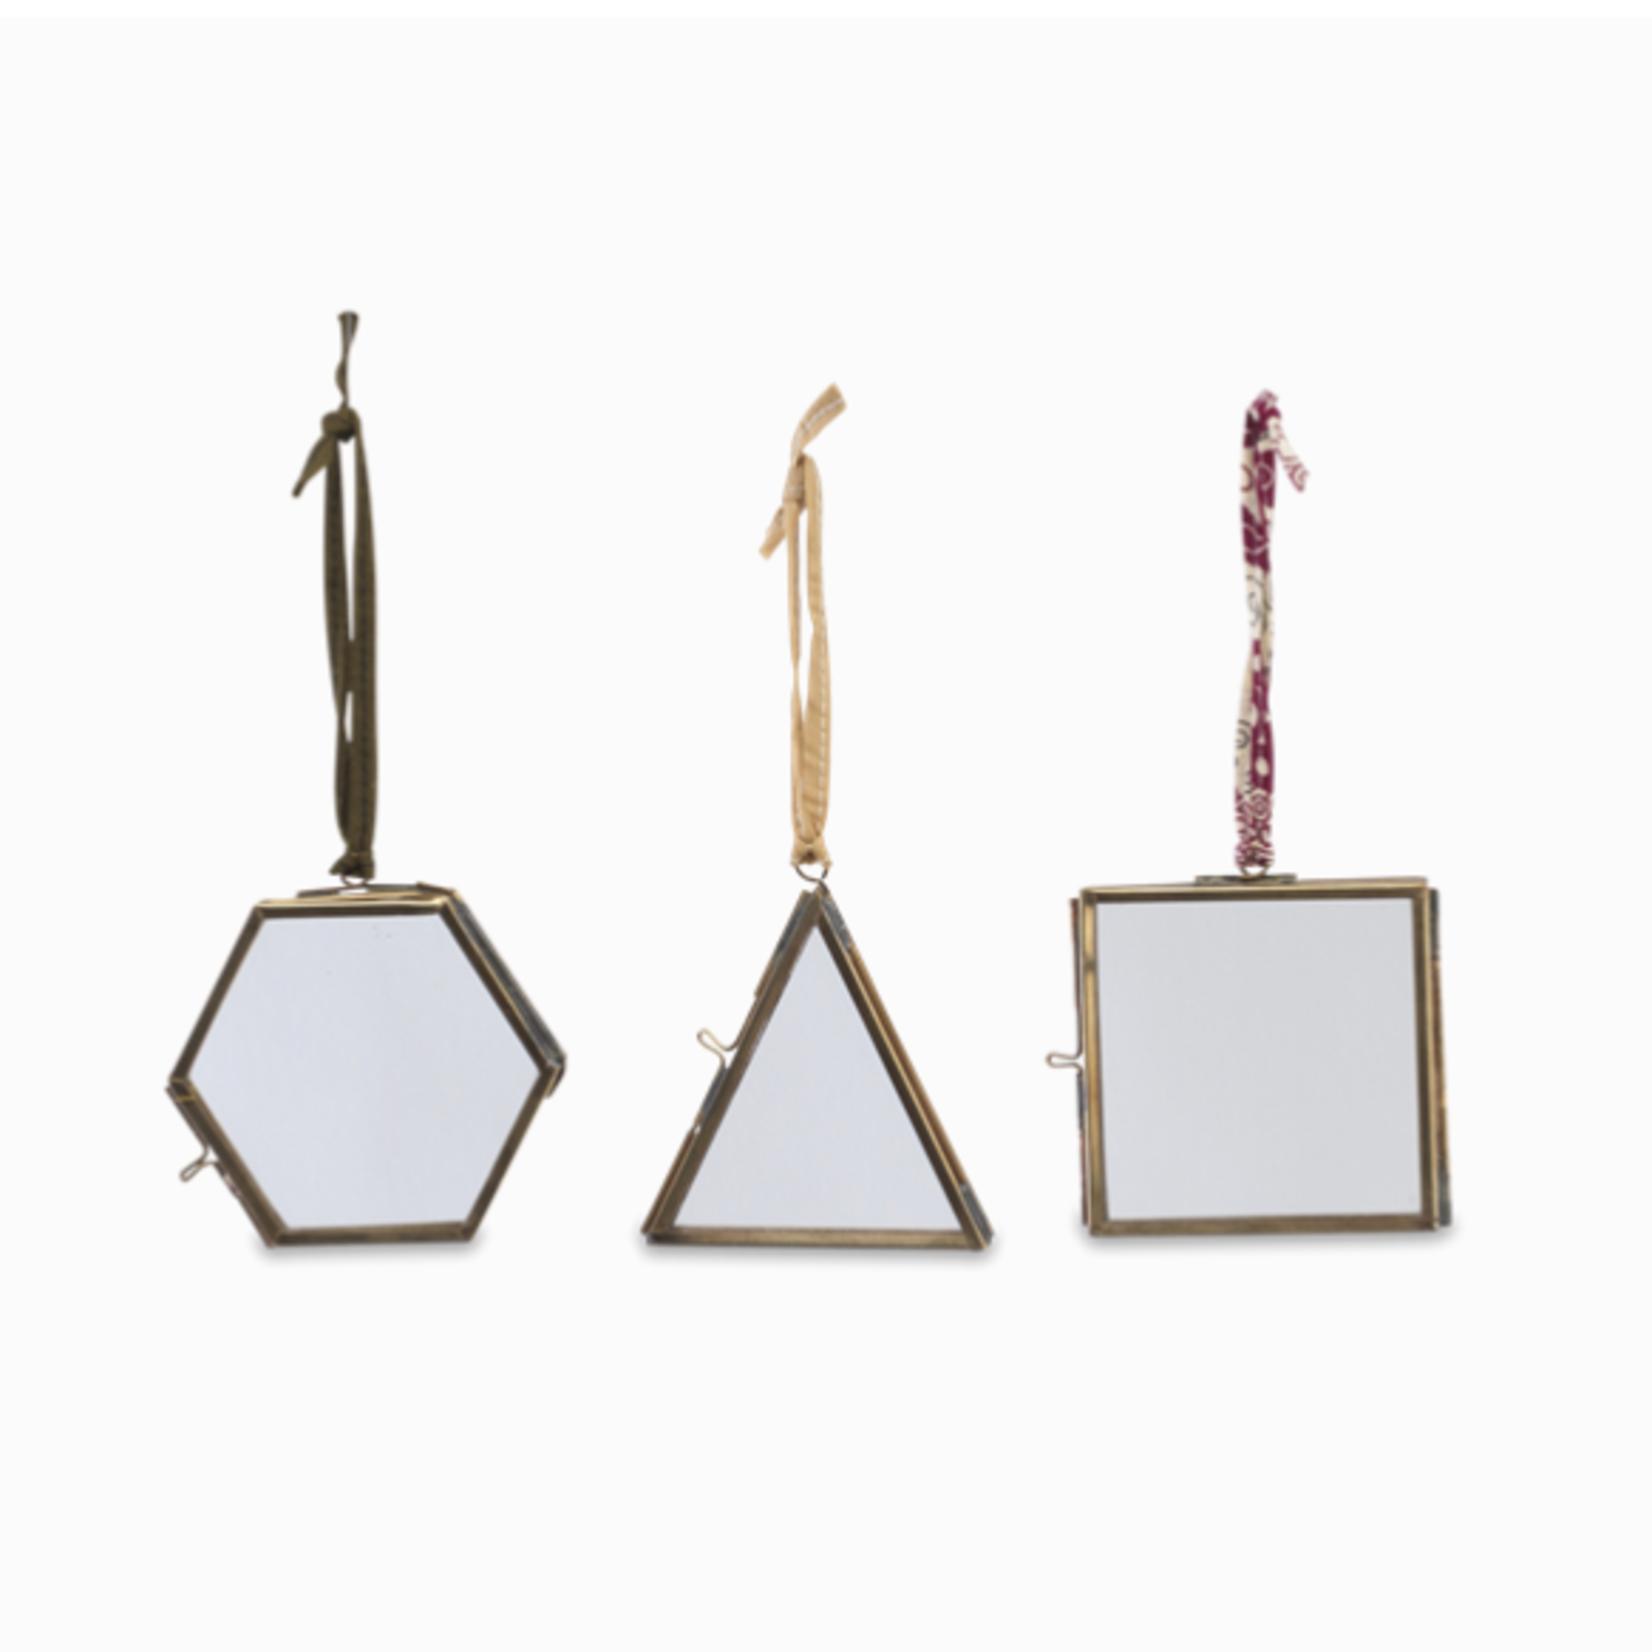 Nkuku Antique Brass Tiny Kiko Decorations - Set of 3 Approx 8 x 7.5 x 0.7cm